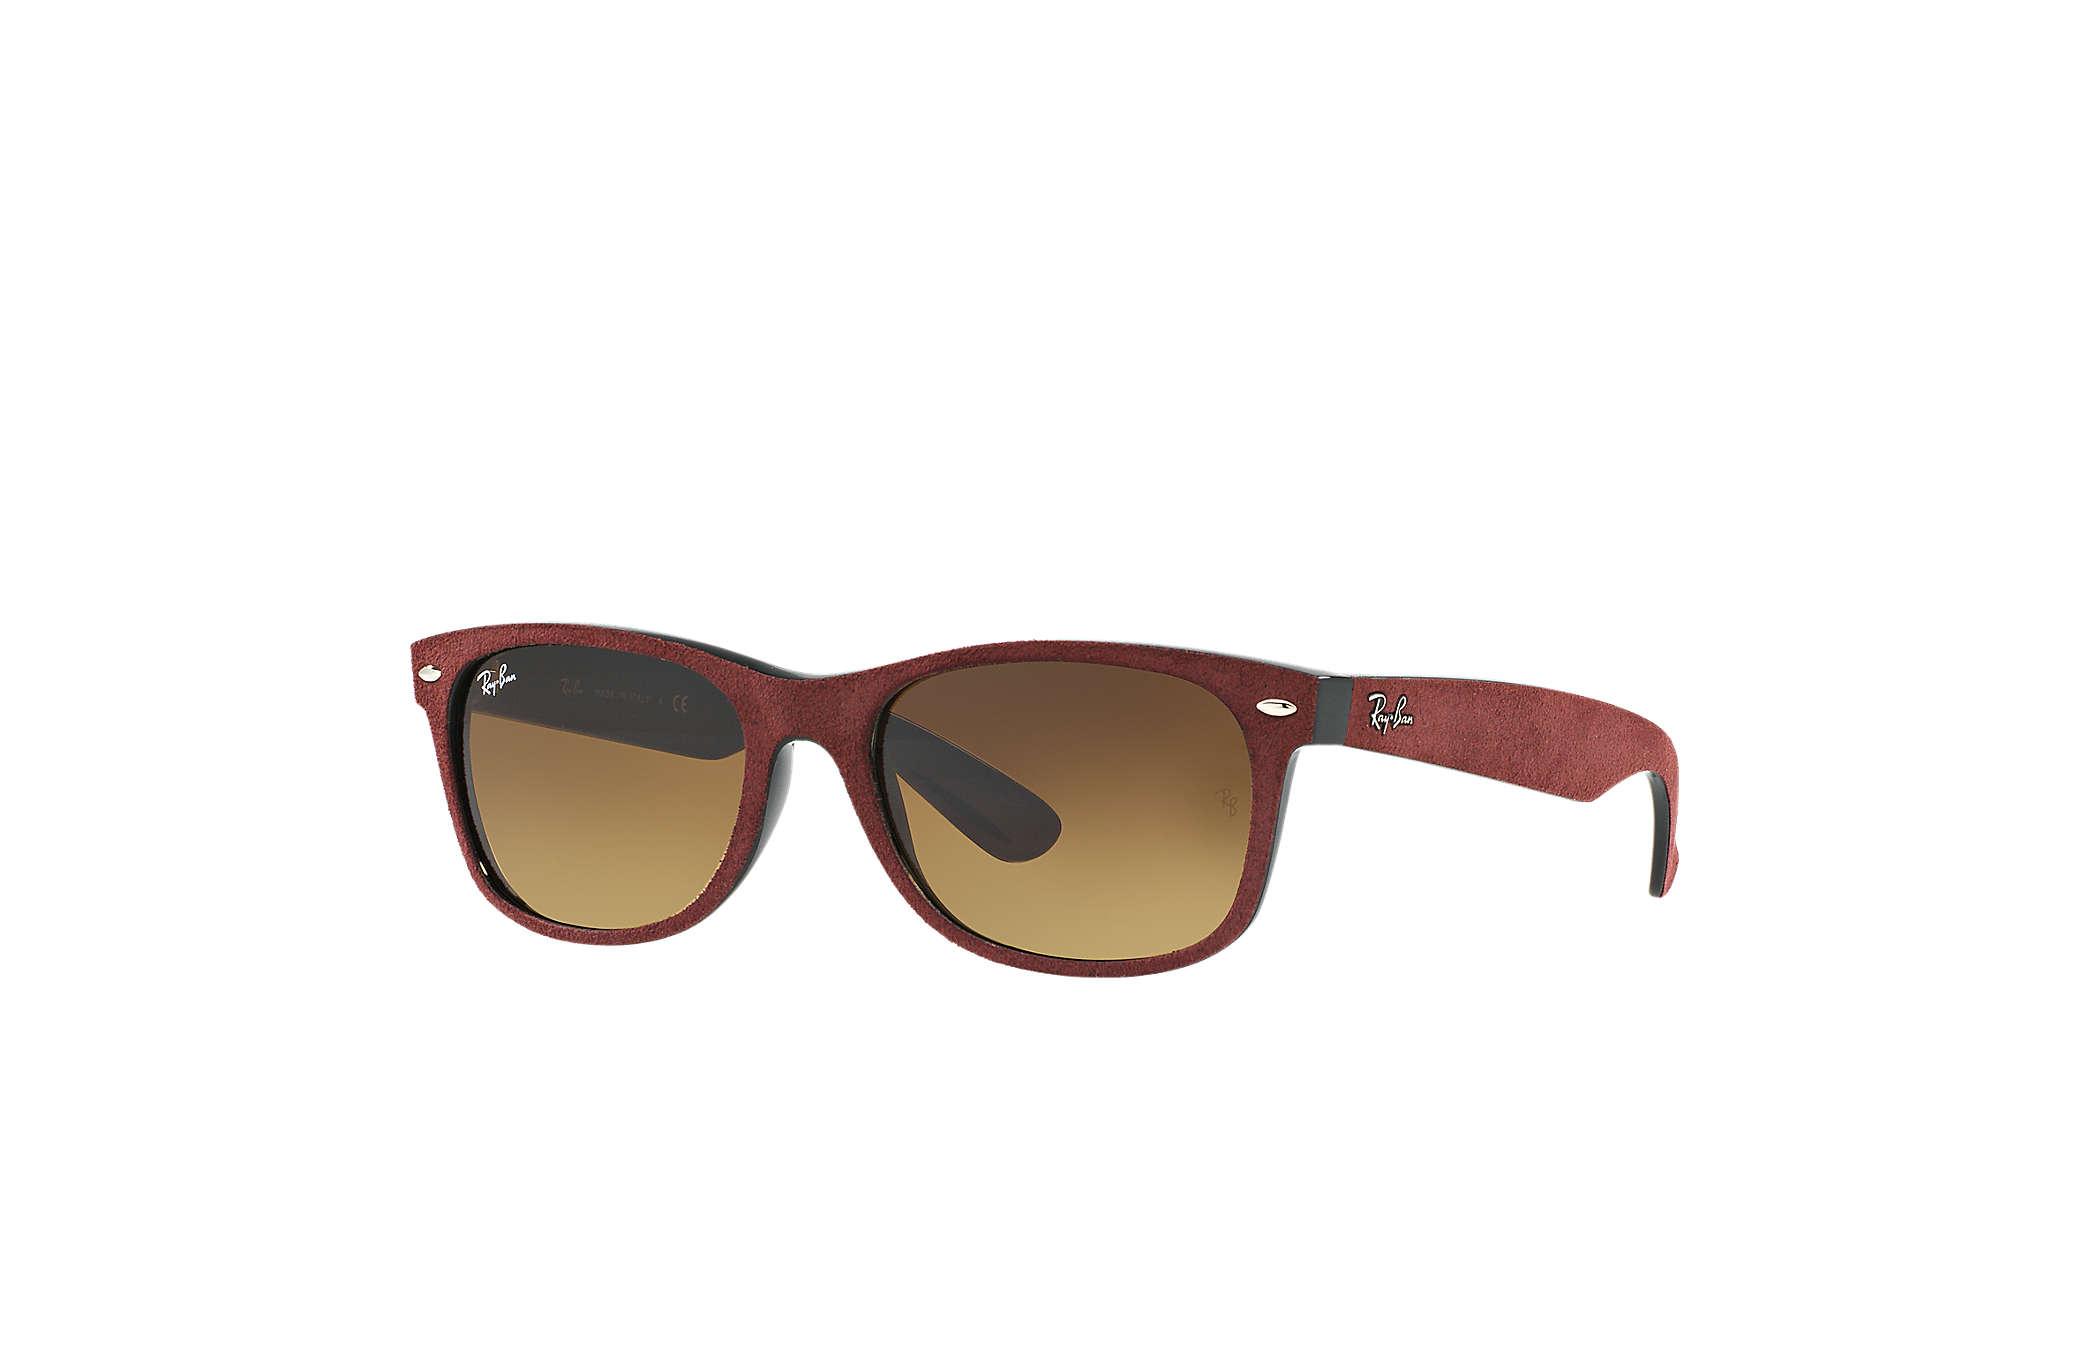 Rb2132 New Wayfarer 624085 Black/top Bordo' Alcantara Brown Gradient 52/18 145 IKzdq